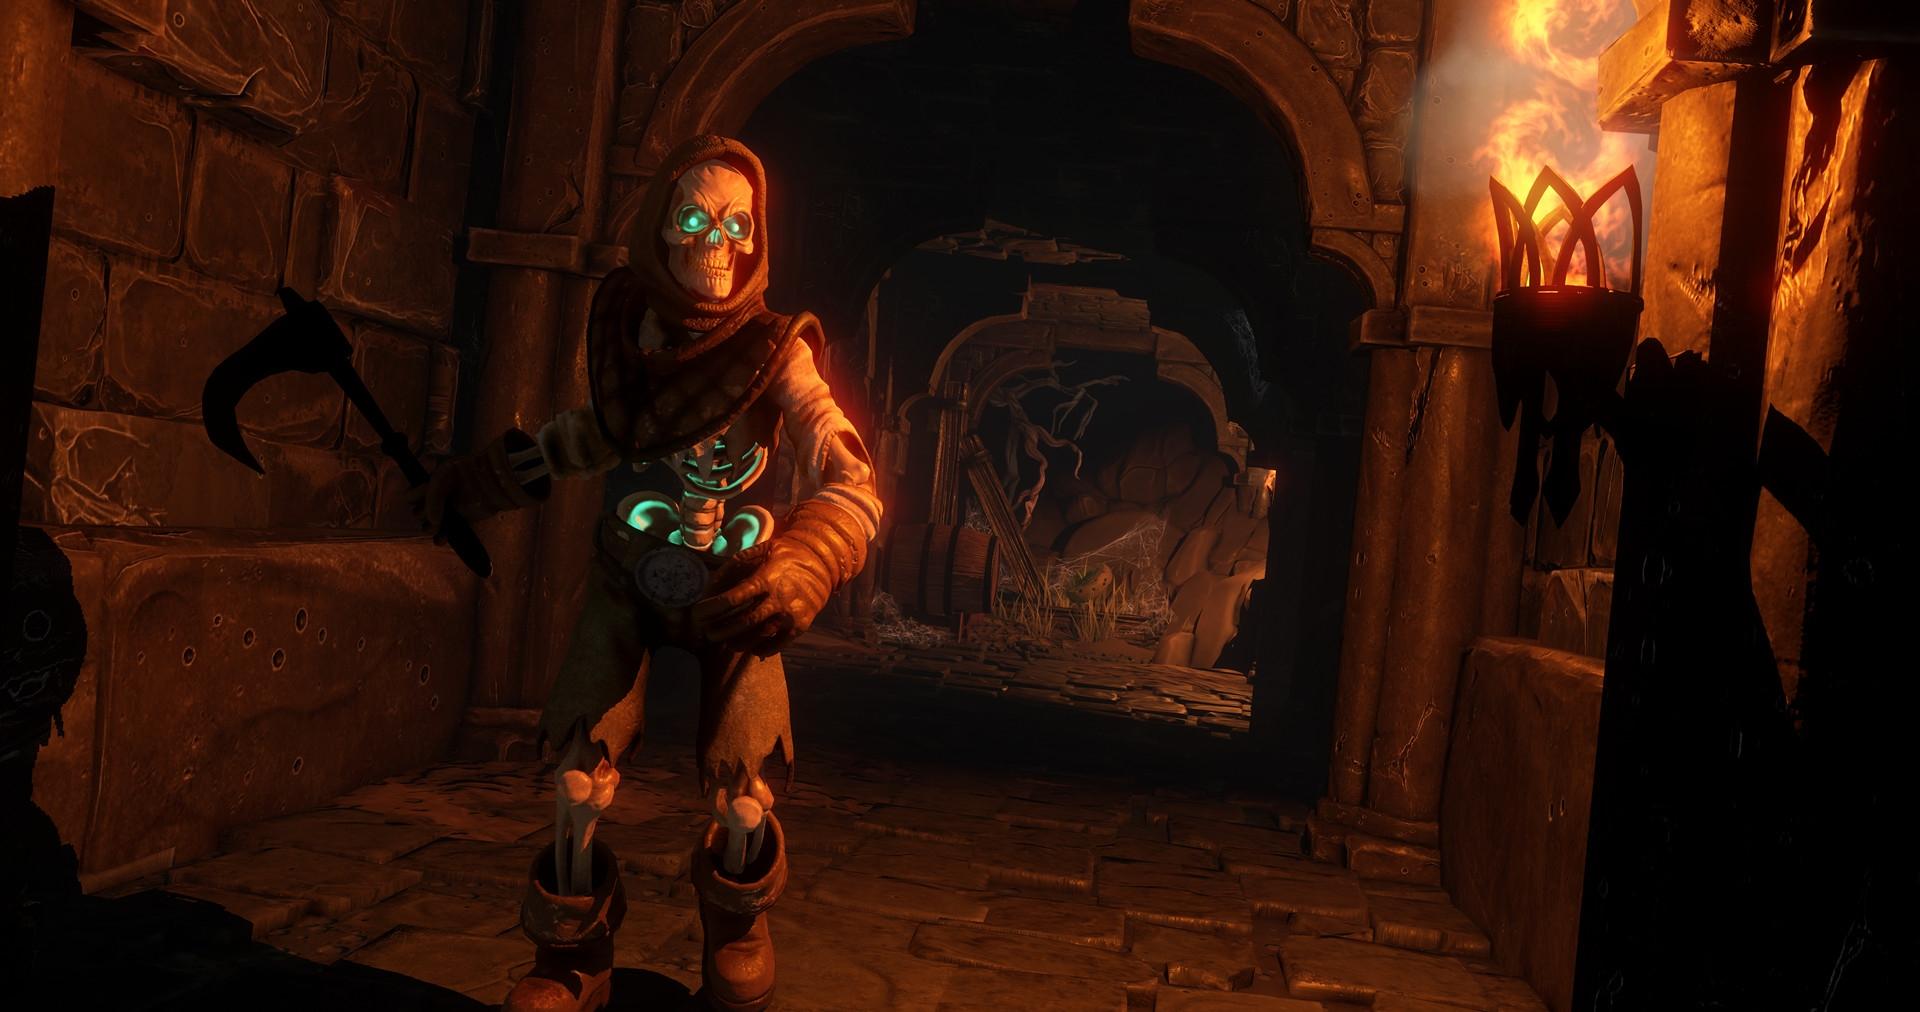 Underworld Ascendant release